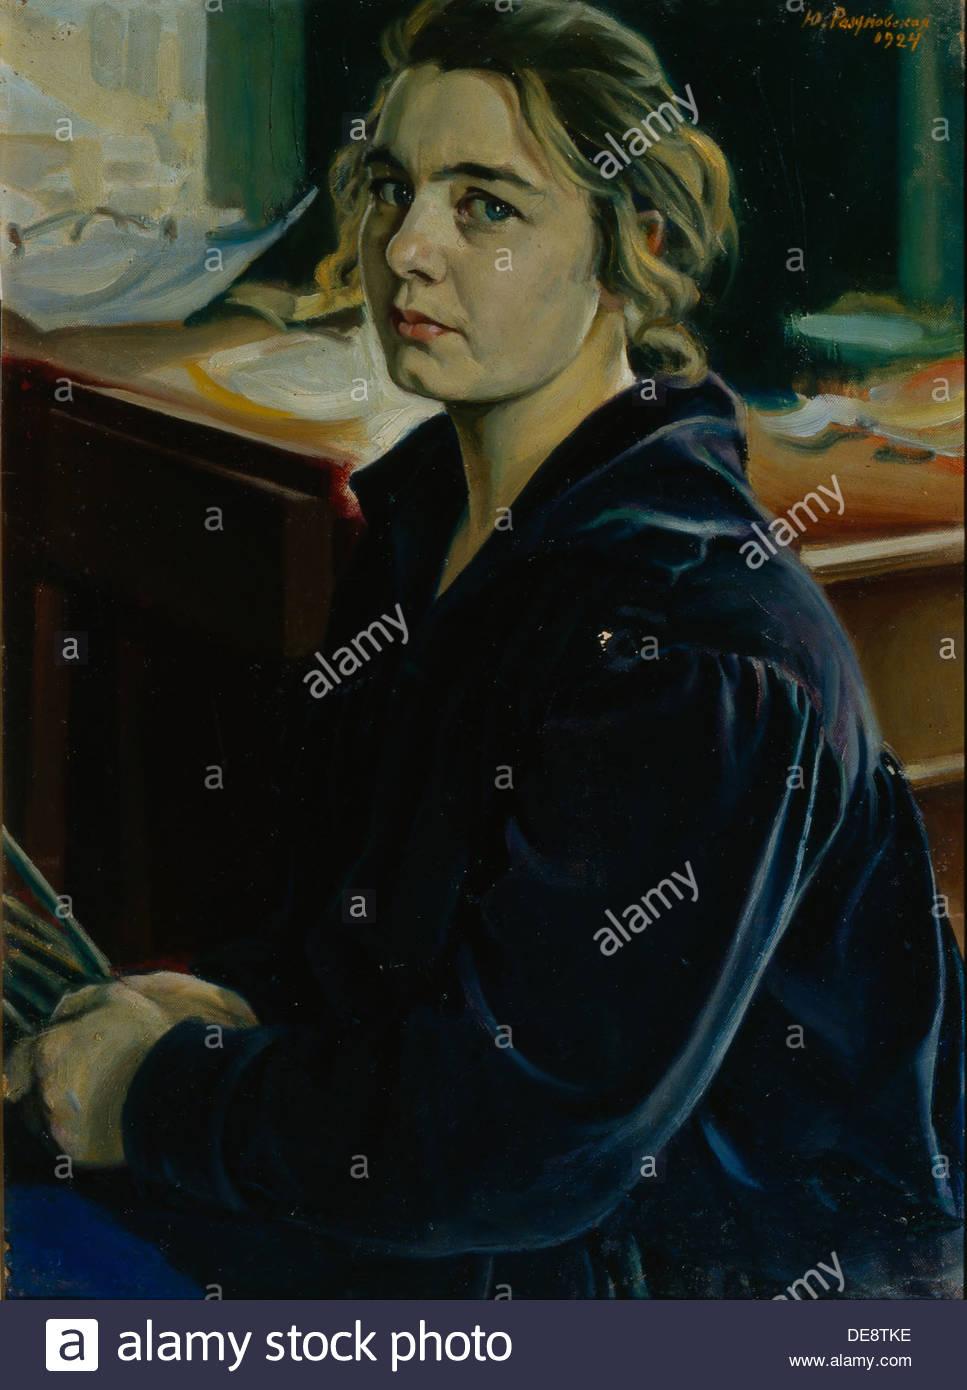 Self-Portrait, 1924. Artist: Razumovskaya, Julia (1896-1987) - Stock Image